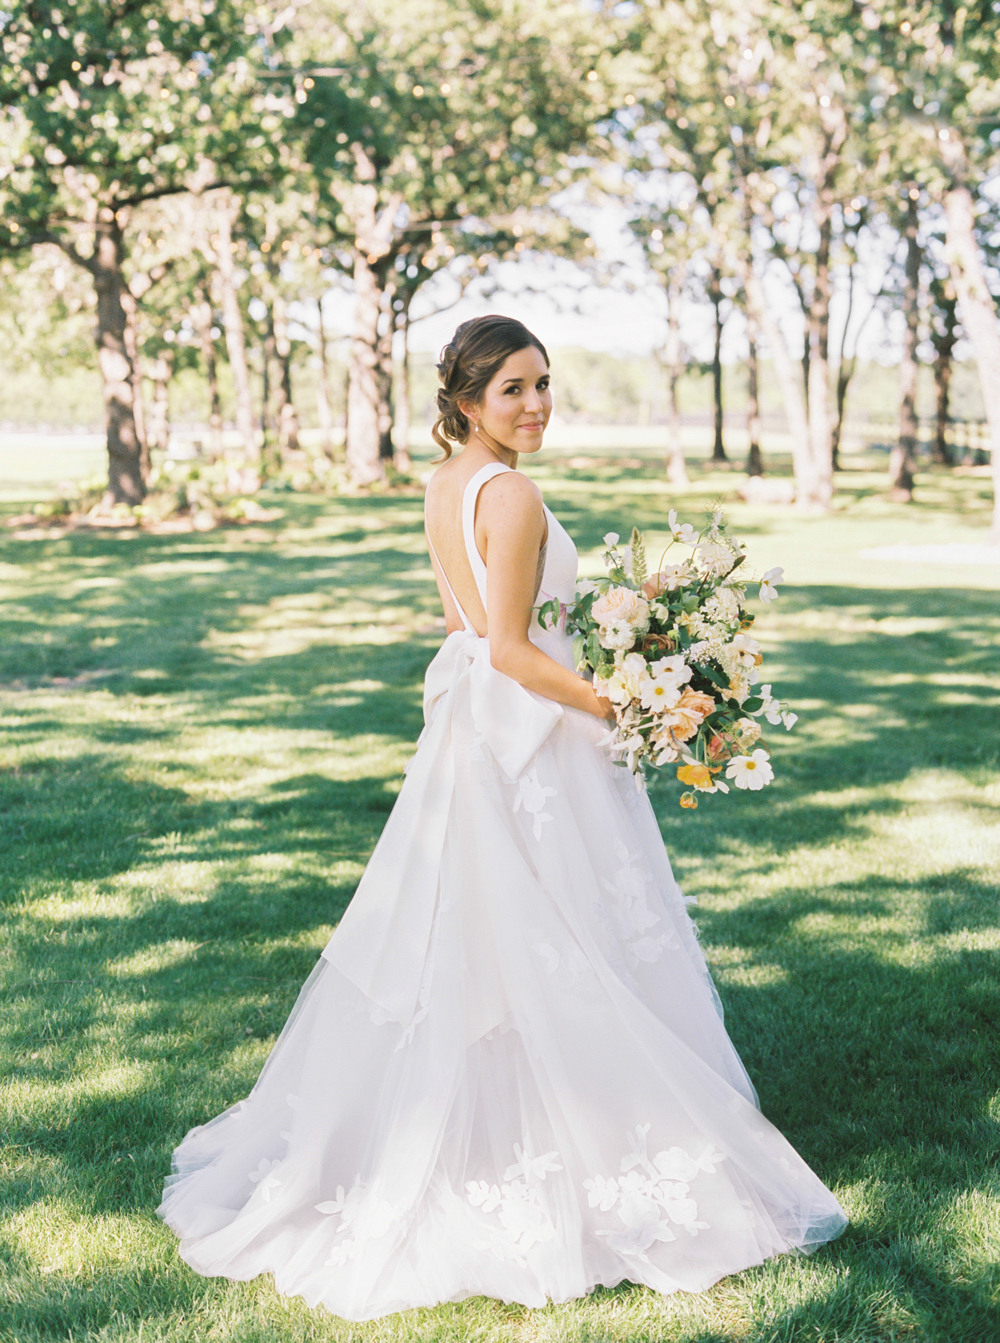 Ball Gown Tulle Wedding Dresses Deep V Neck Appliques Garden Bridal ...